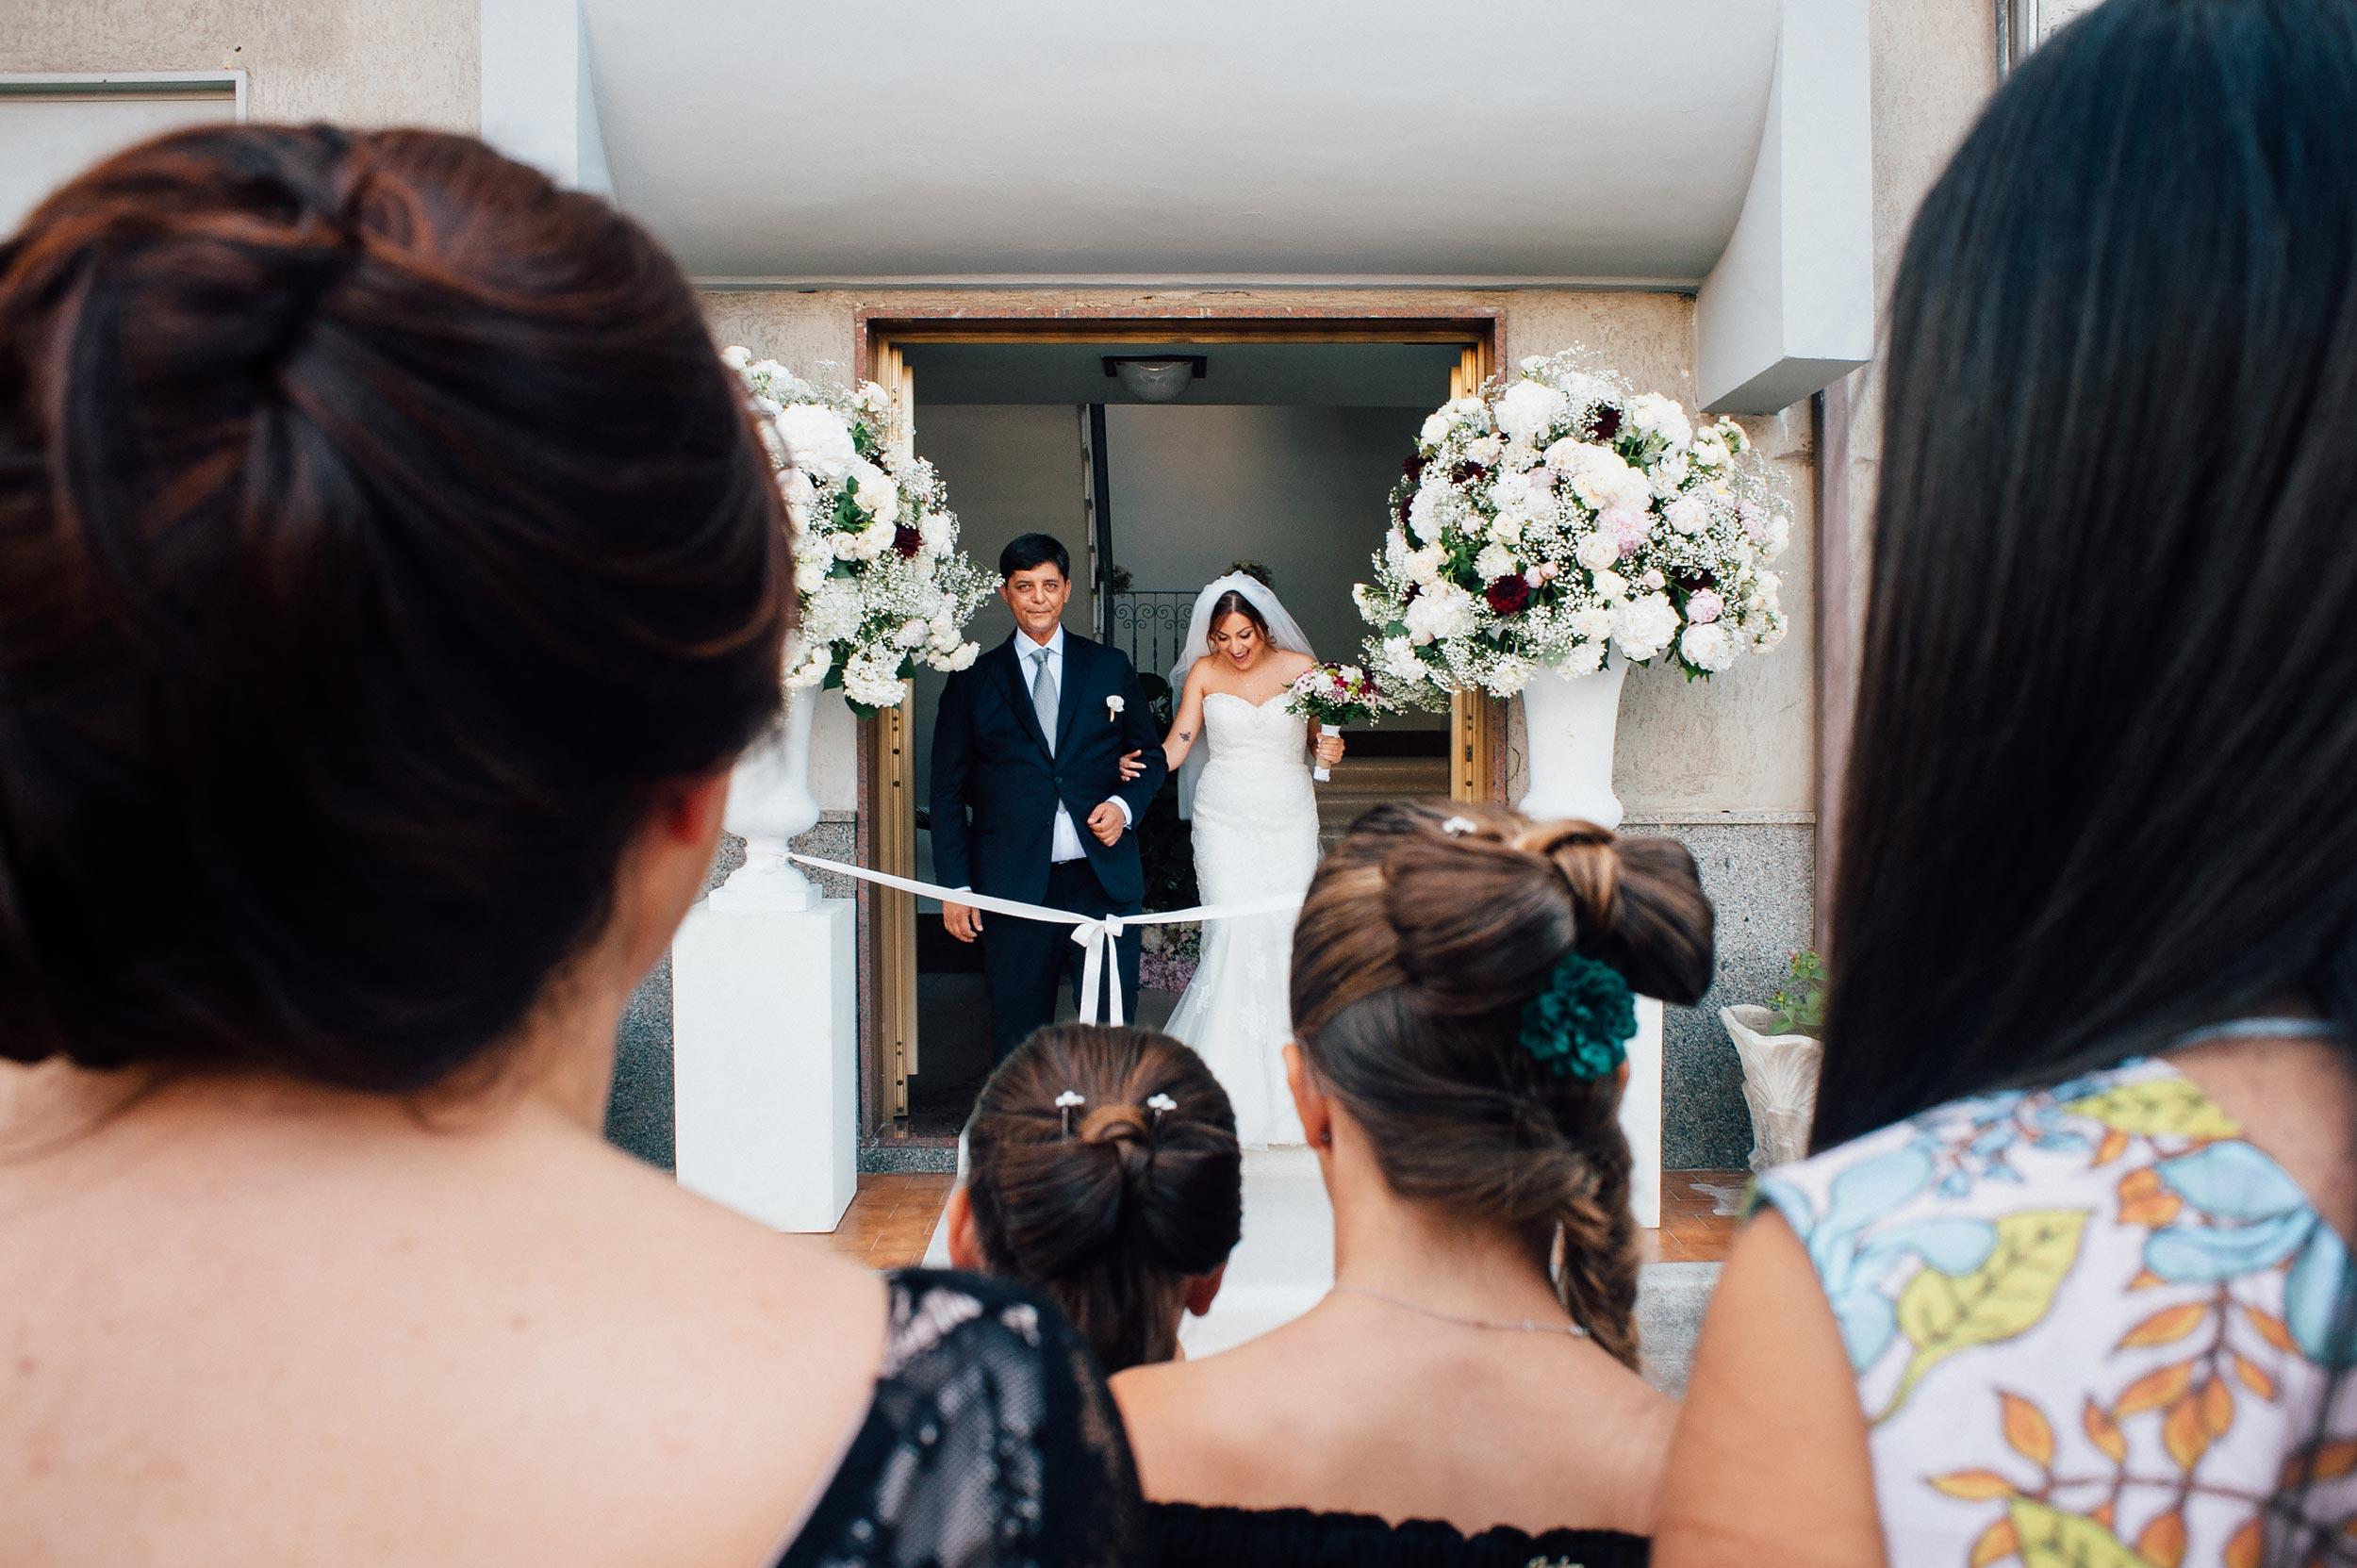 2016-Claudio-Teresa-Naples-Wedding-Photographer-Italy-Alessandro-Avenali-36.jpg